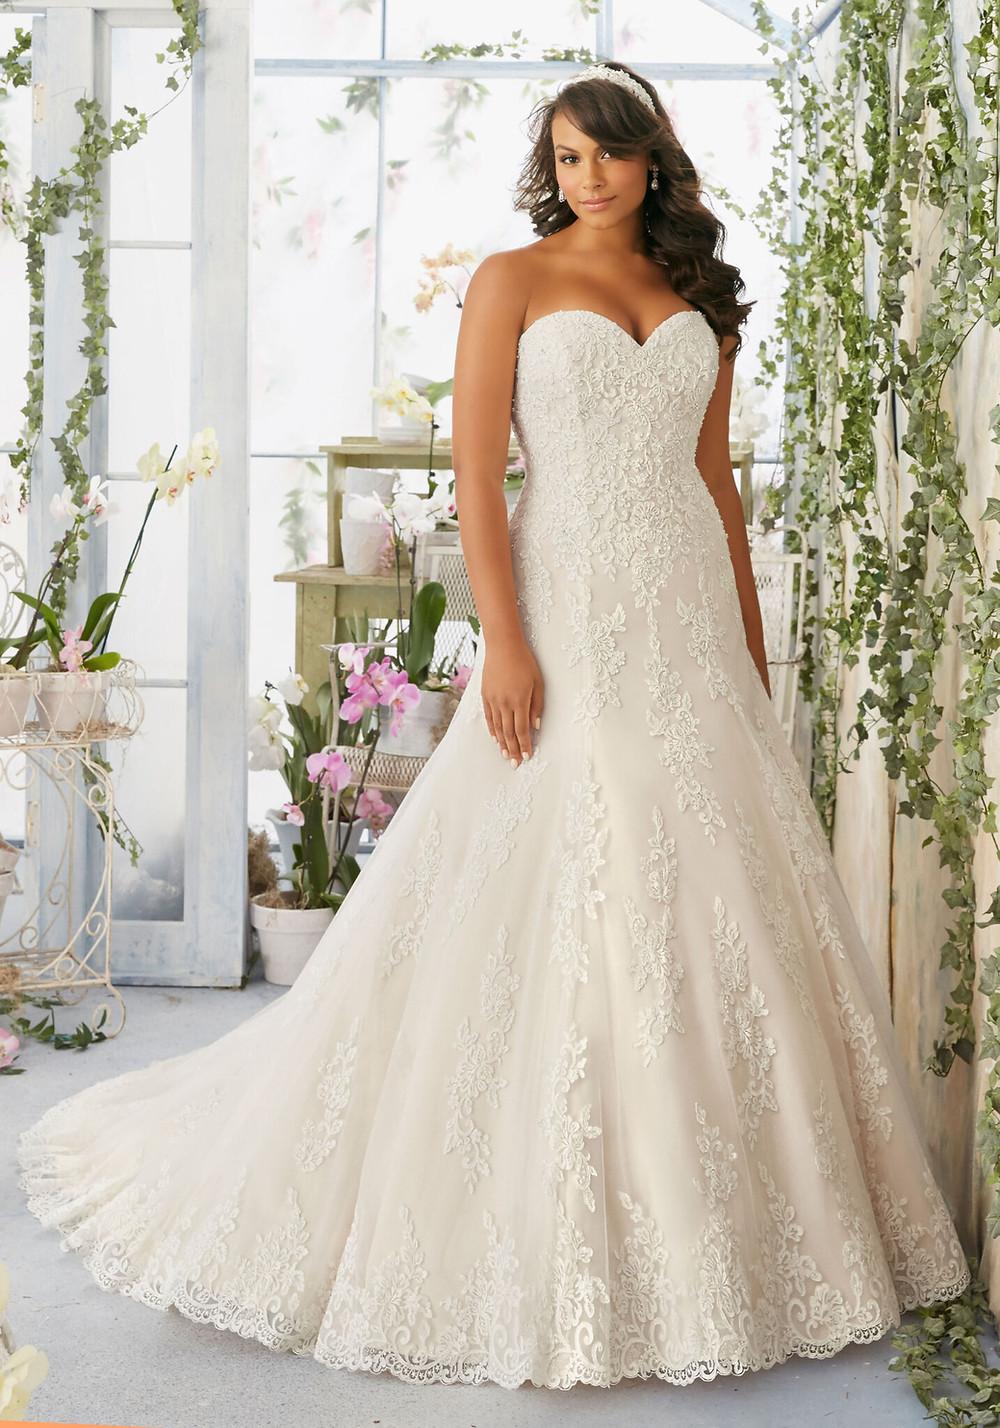 Plus size wedding gown at Amour Bridal Austin Texas